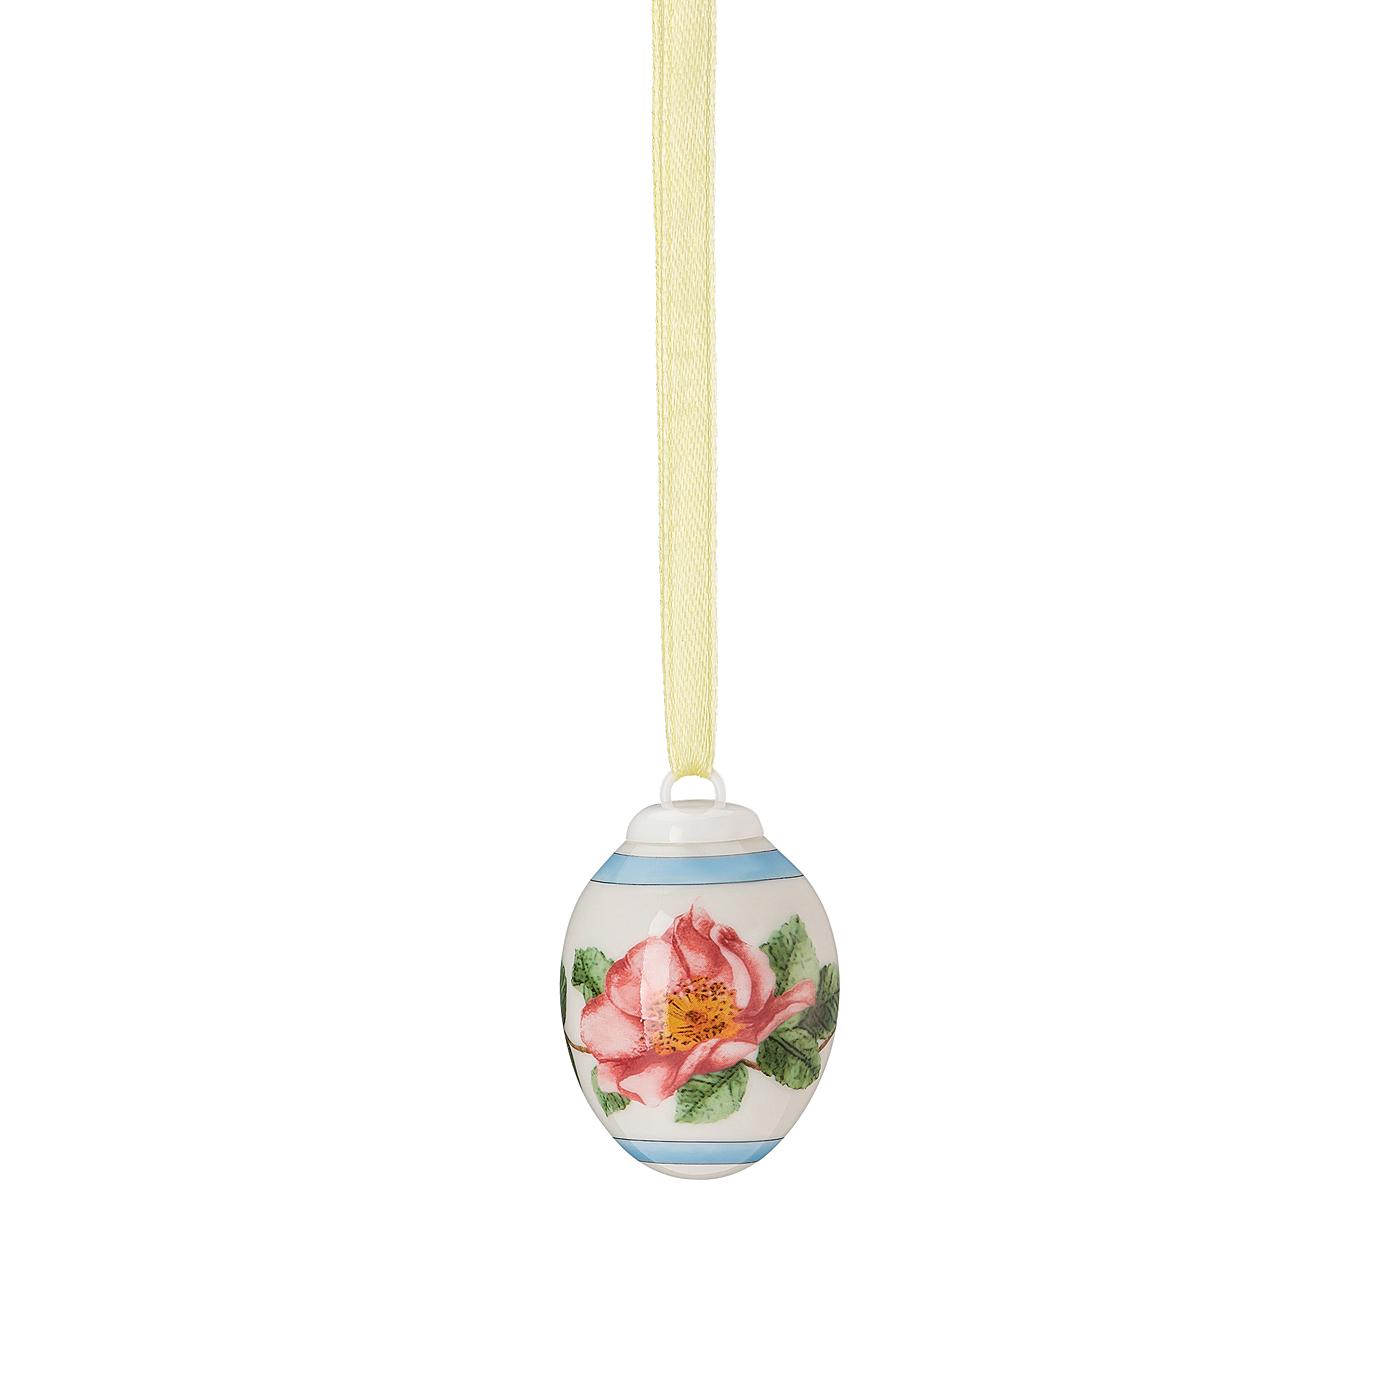 Porzellan-Mini-Ei Frühlingswiese Heckenrose - rosé Hutschenreuther